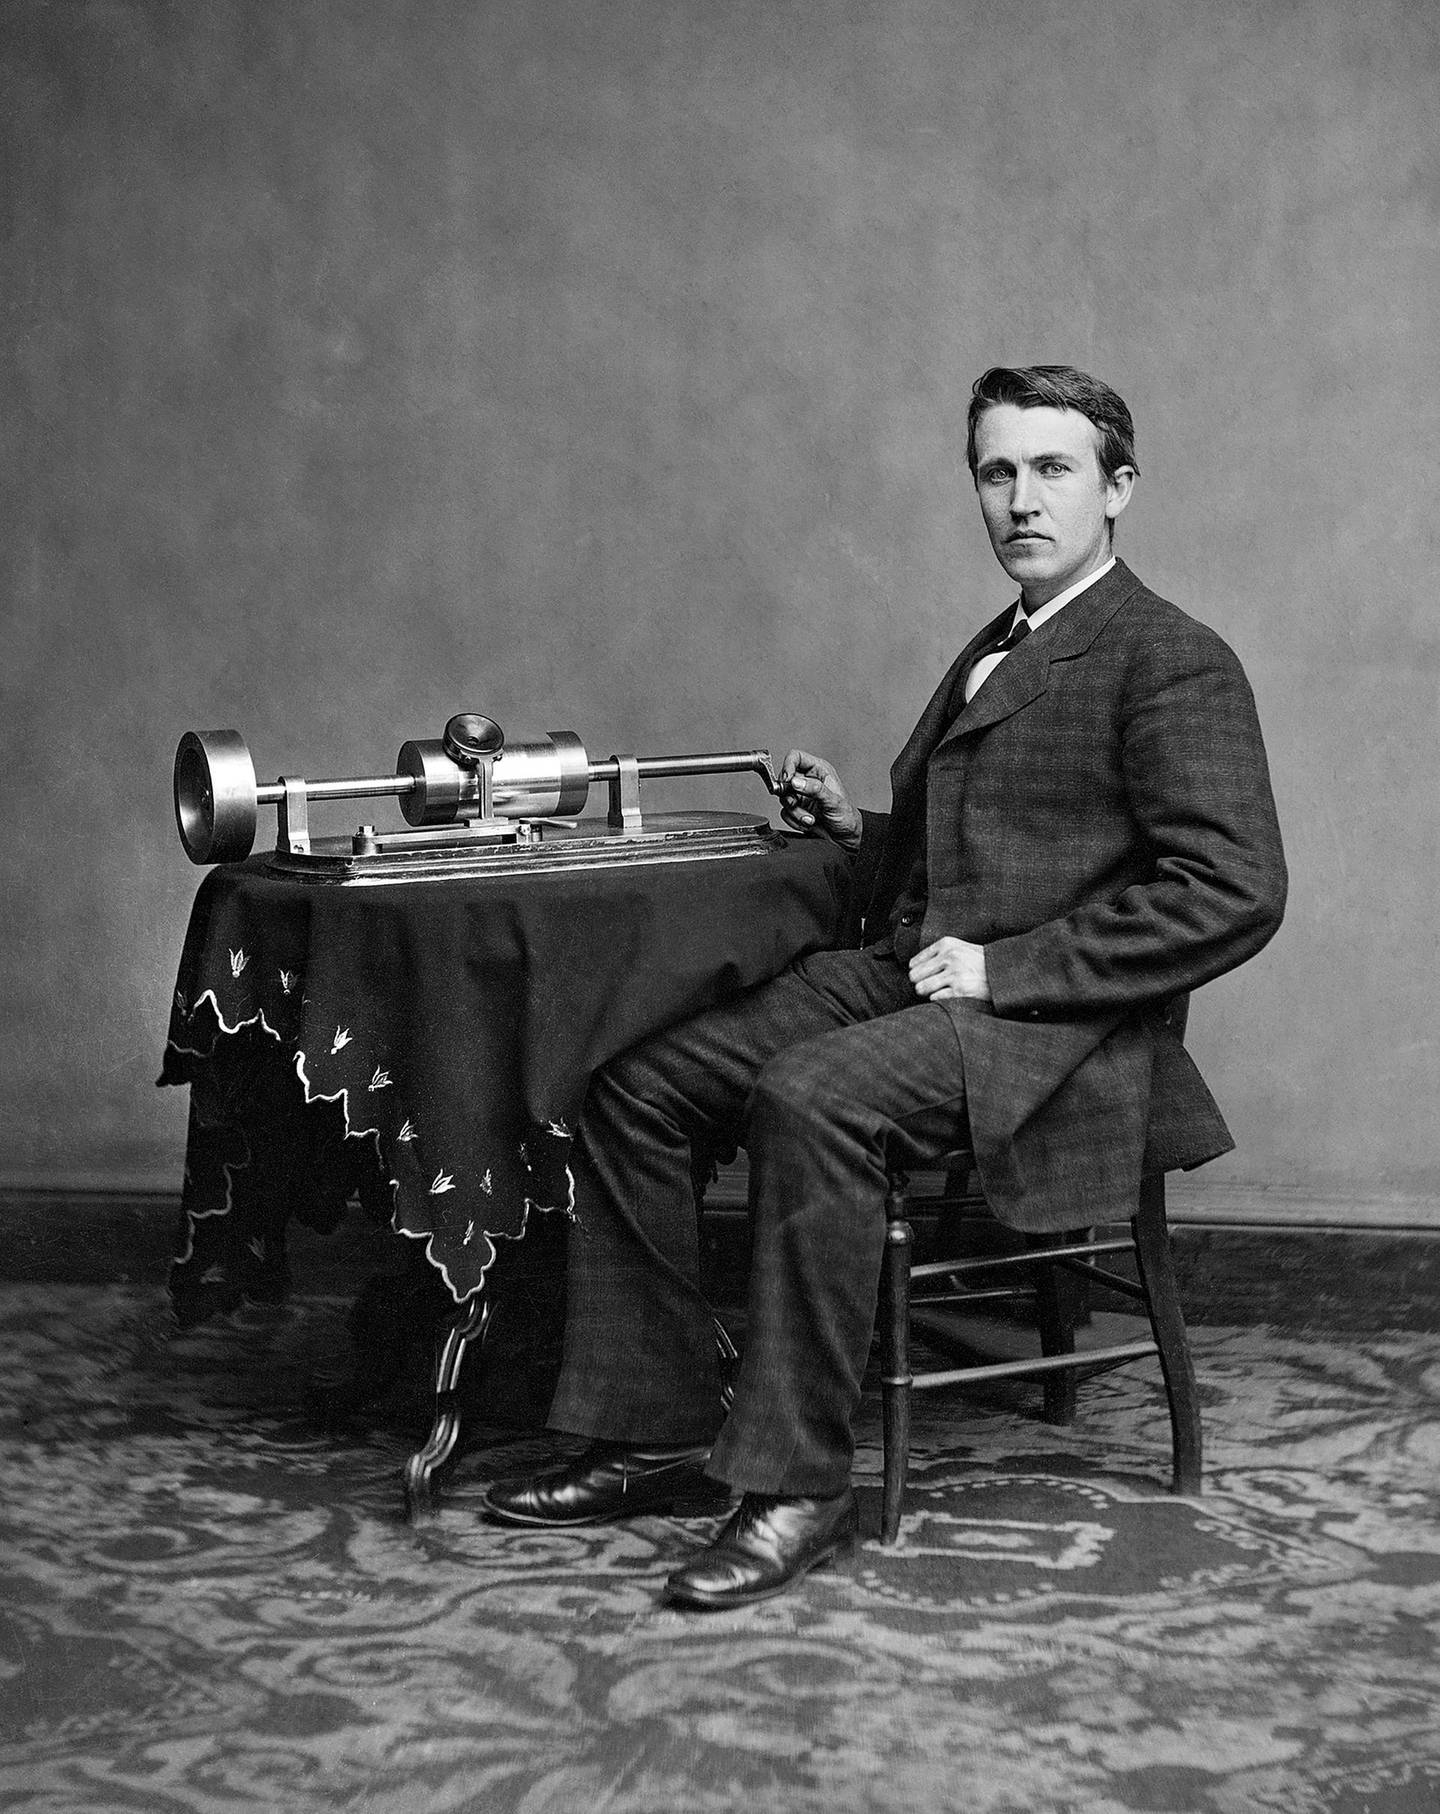 1878 - Edison and phonograph. Photo: Bureau International des Expositions